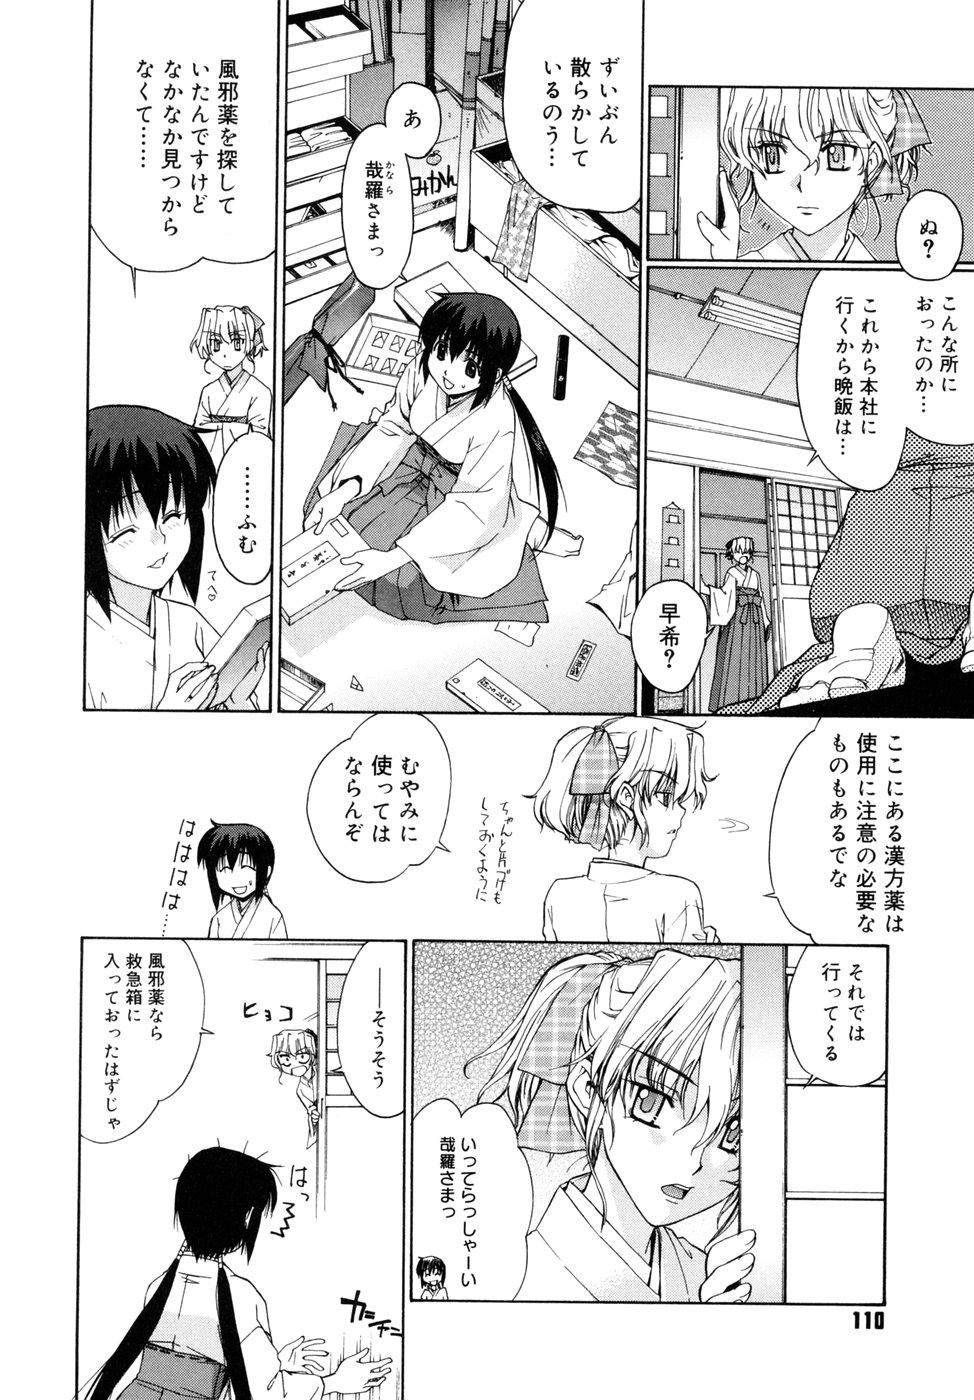 [Yaya Hinata] Tonari no Miko-san wa Minna Warau - The next shrine maidens smile in everyone. 109